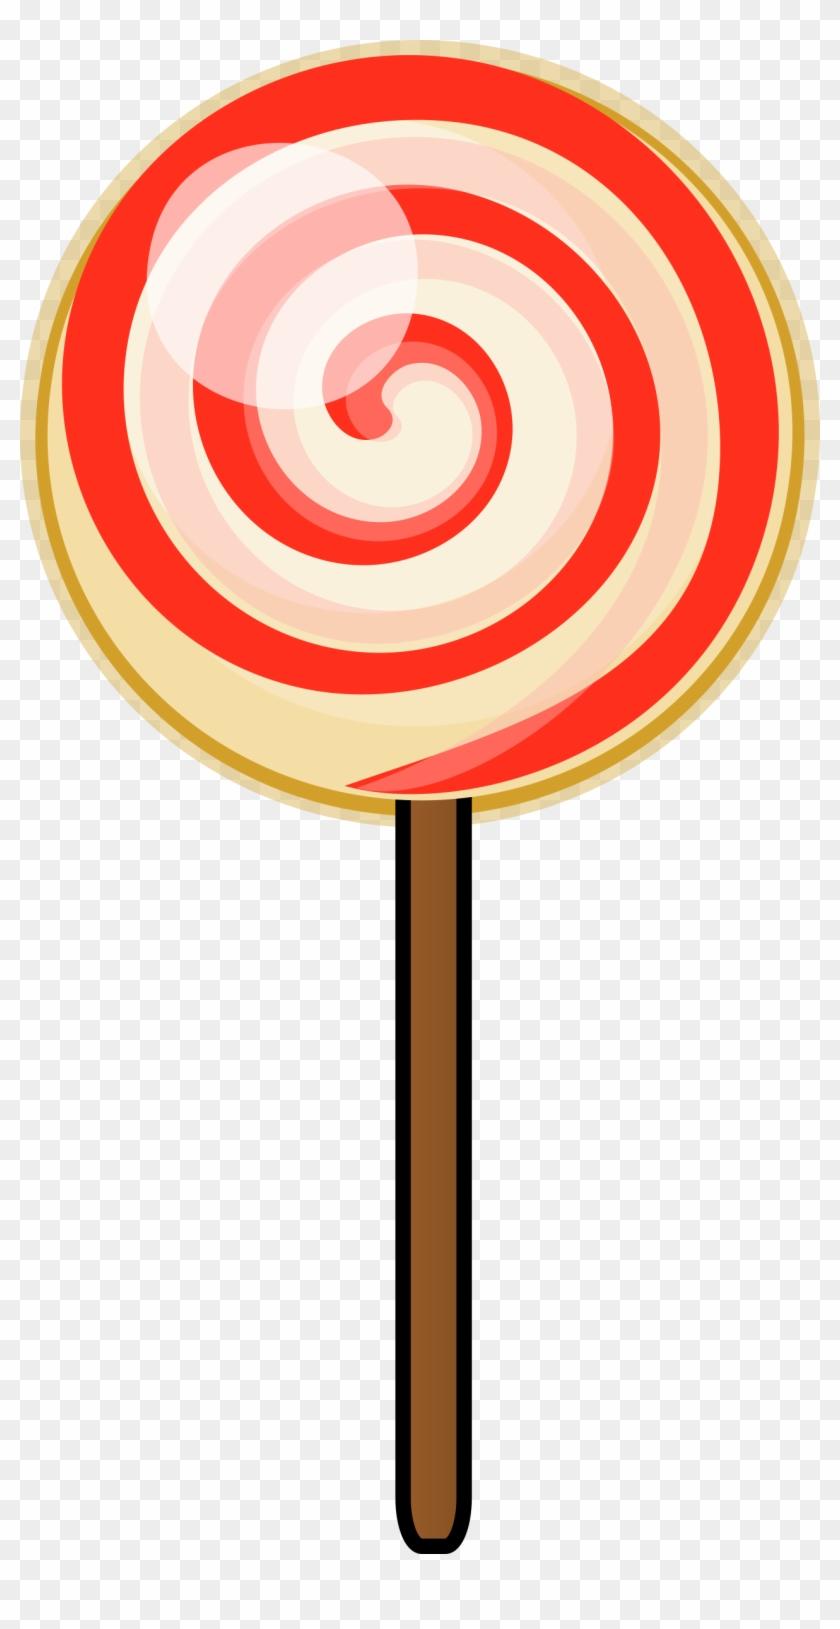 medium resolution of office clip art striped lollipop clipart free download lollipop png